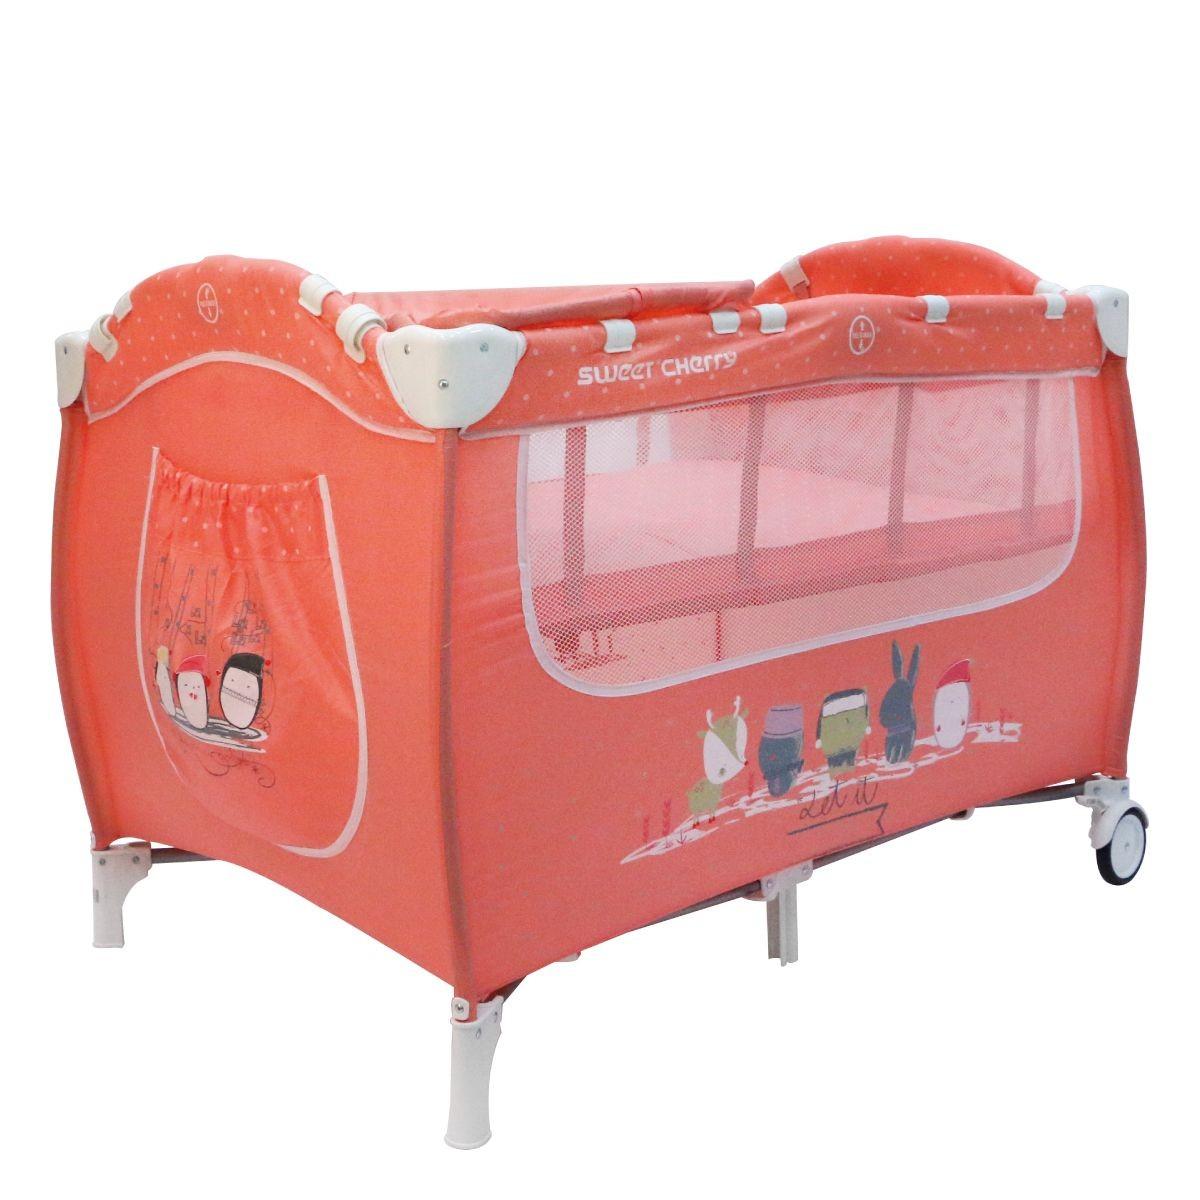 Frenzy Playpen - Kico Baby Center